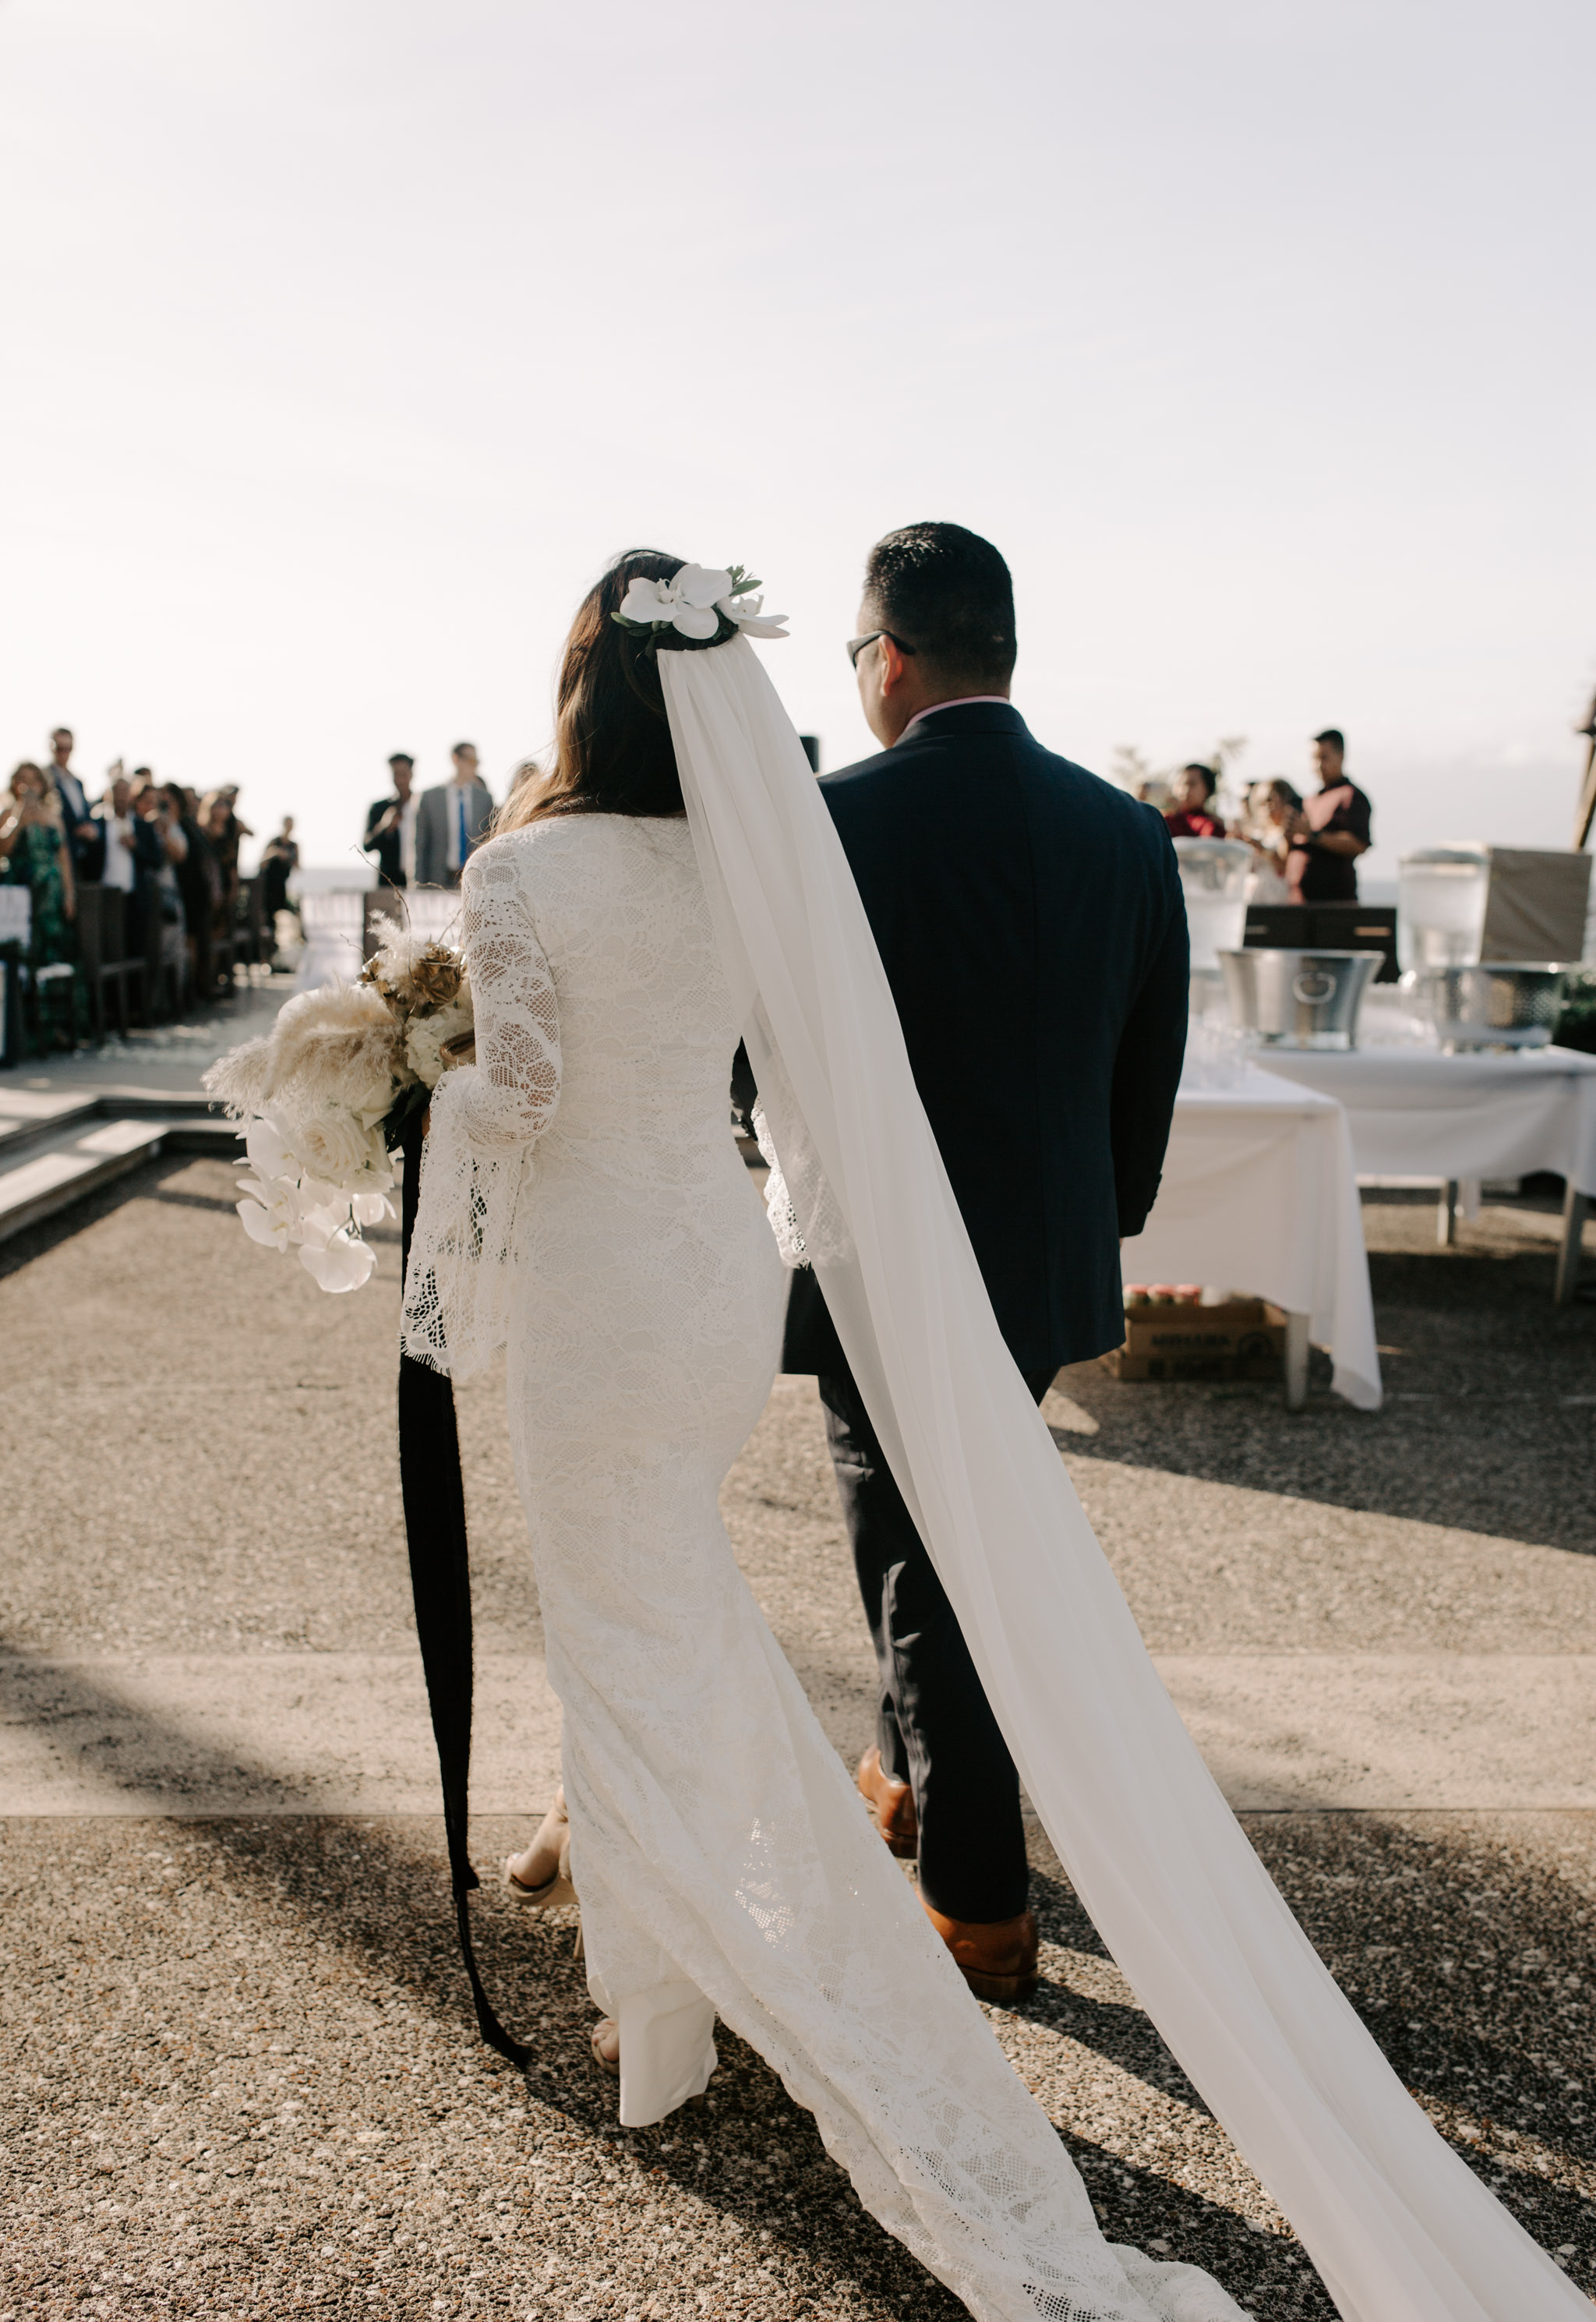 Father walking bride down the aisle   Merriman's Kapalua Maui wedding by Hawaii wedding photographer Desiree Leilani